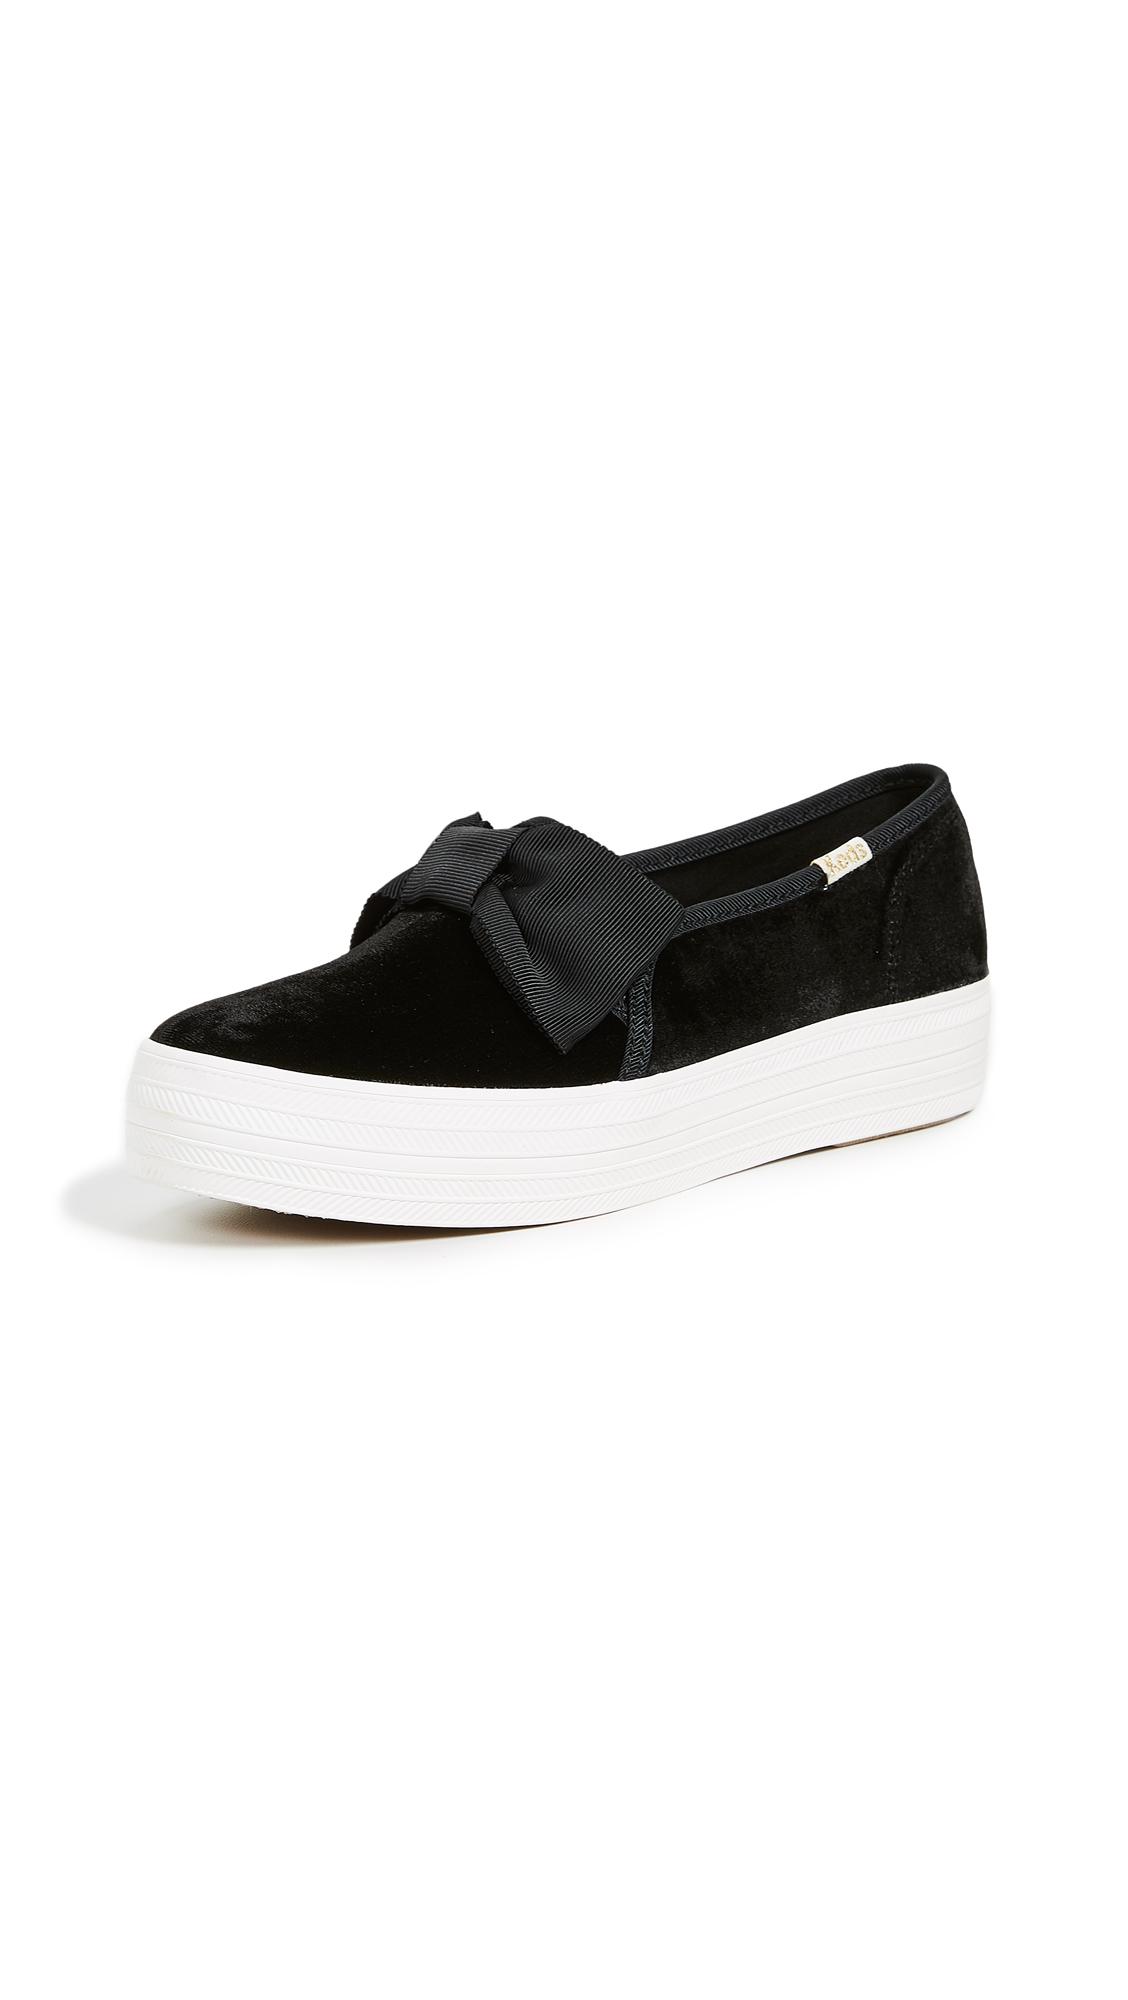 Keds x Kate Spade New York Triple Decker Sneakers - Black